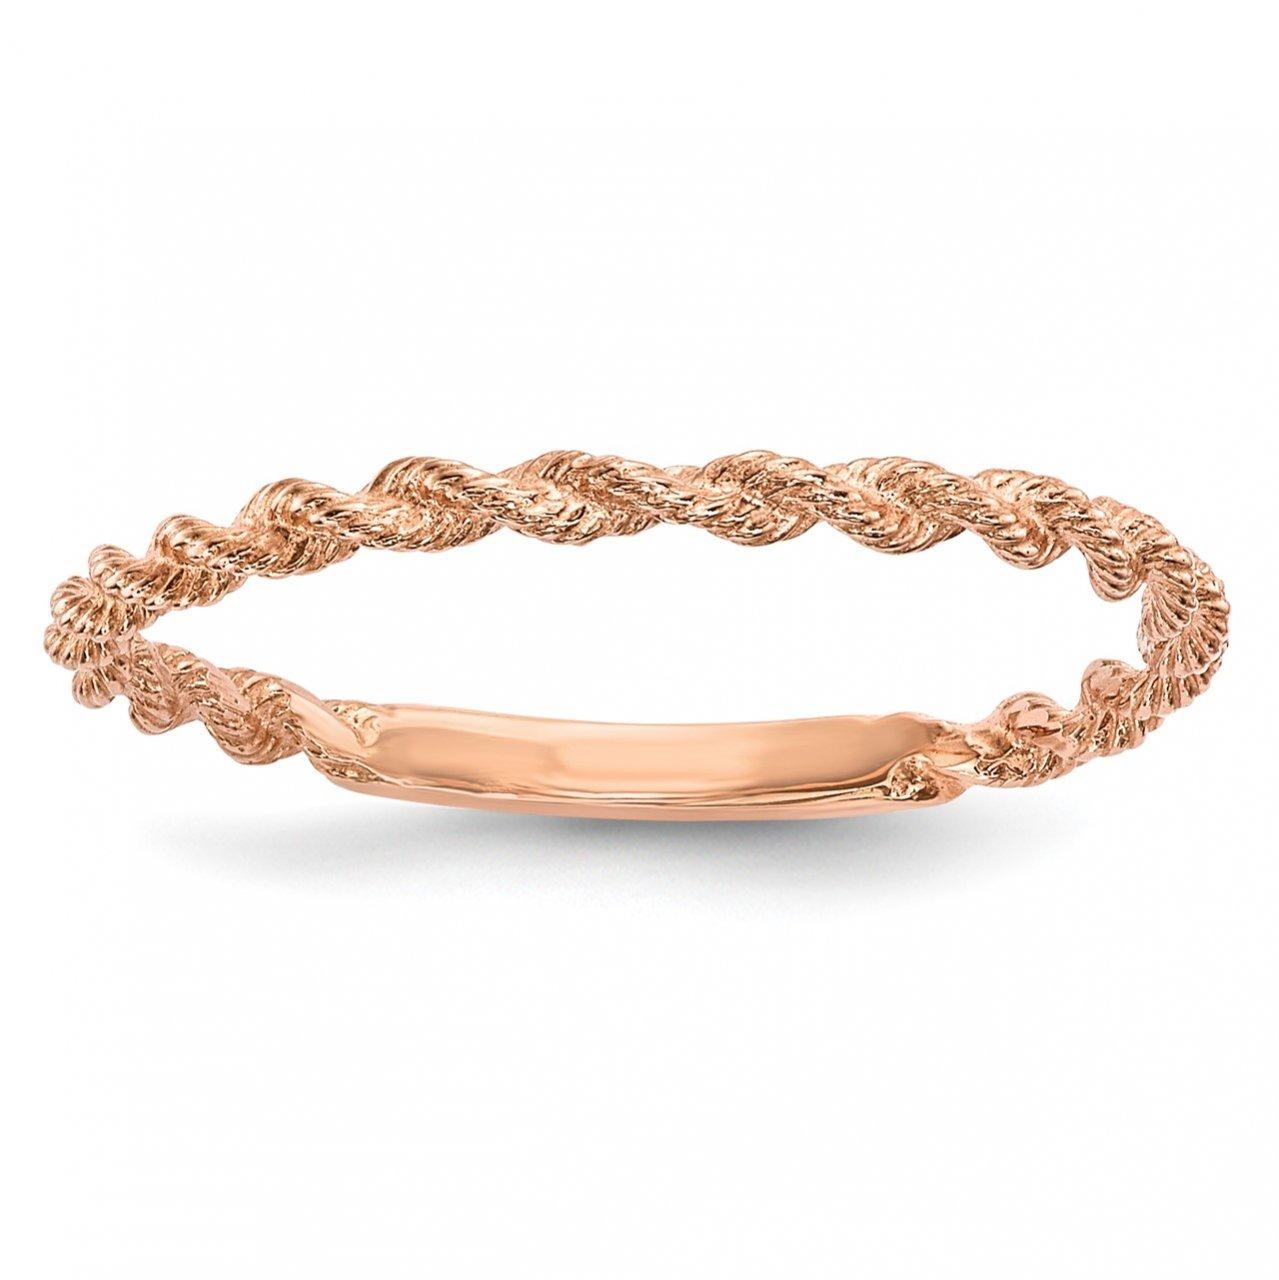 14k Rose Gold Polished Twisted Rope Ring